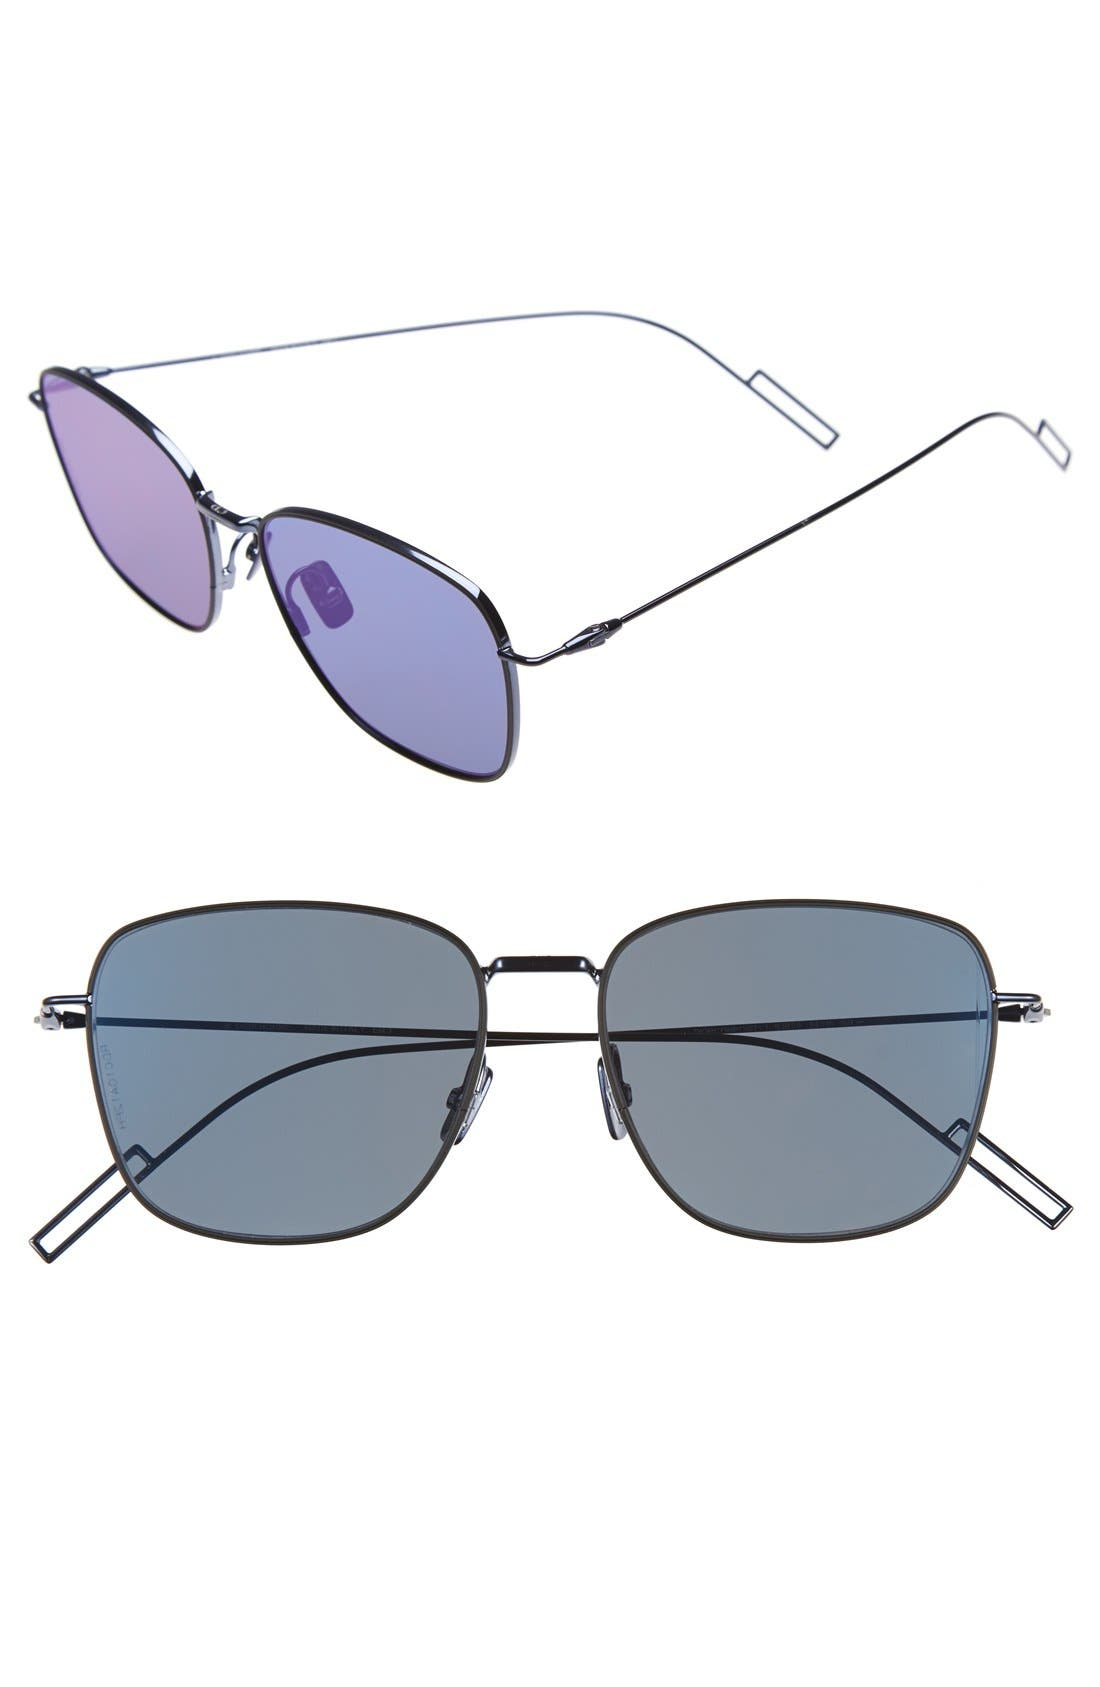 Main Image - Dior Homme 'Composit 1.1S' 54mm Metal Sunglasses